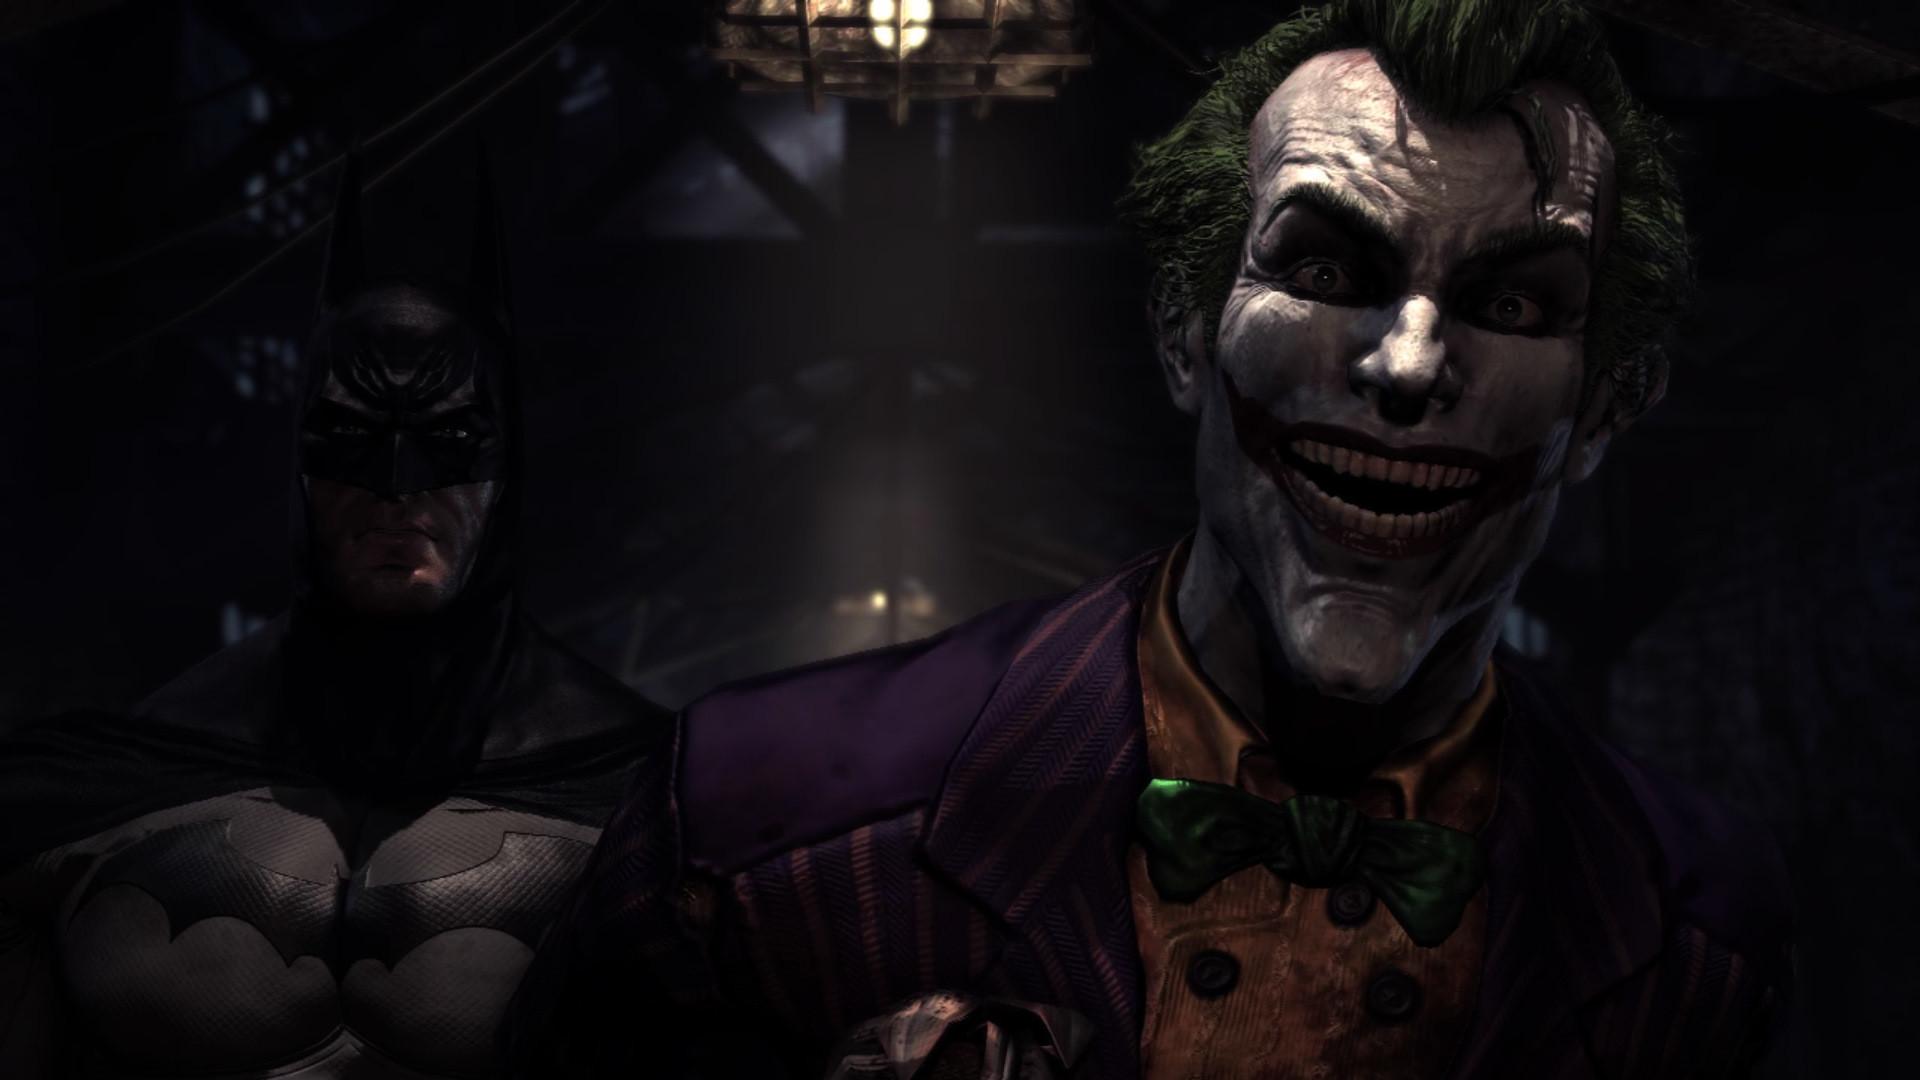 The Joker And Batman Wallpapers HD Wallpaper | Movies Wallpapers